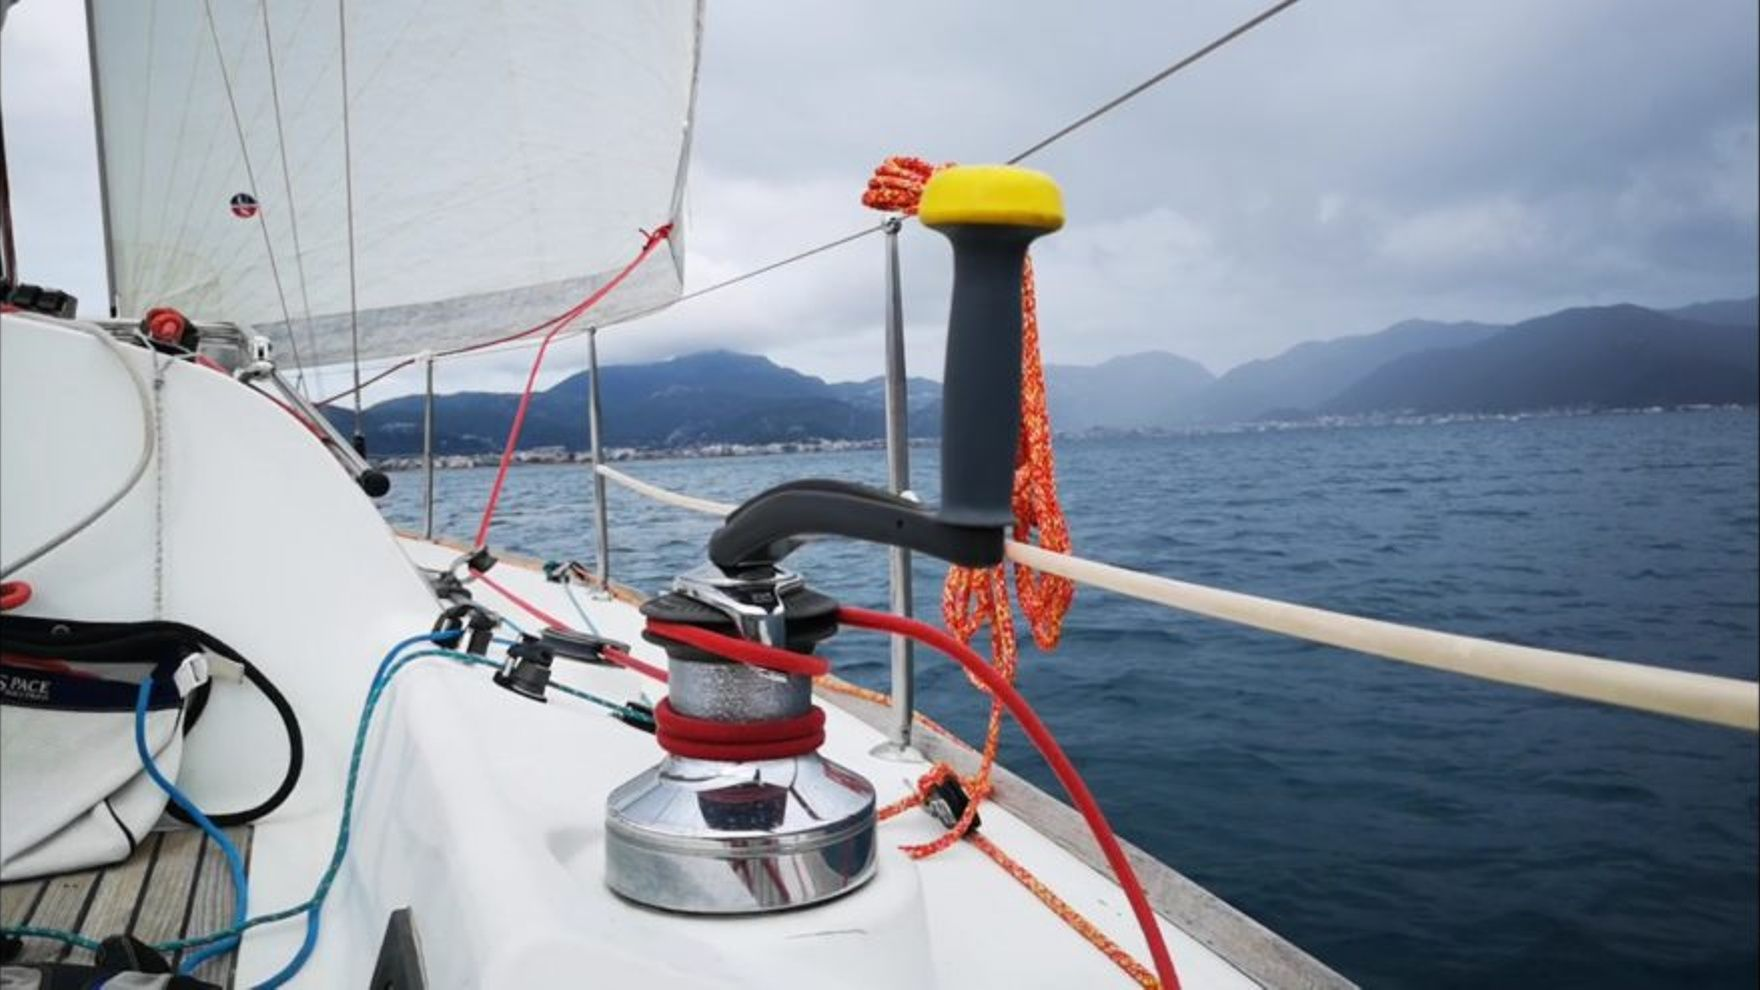 Video seminars: Principles and Methods of Tuning a Racing Yacht